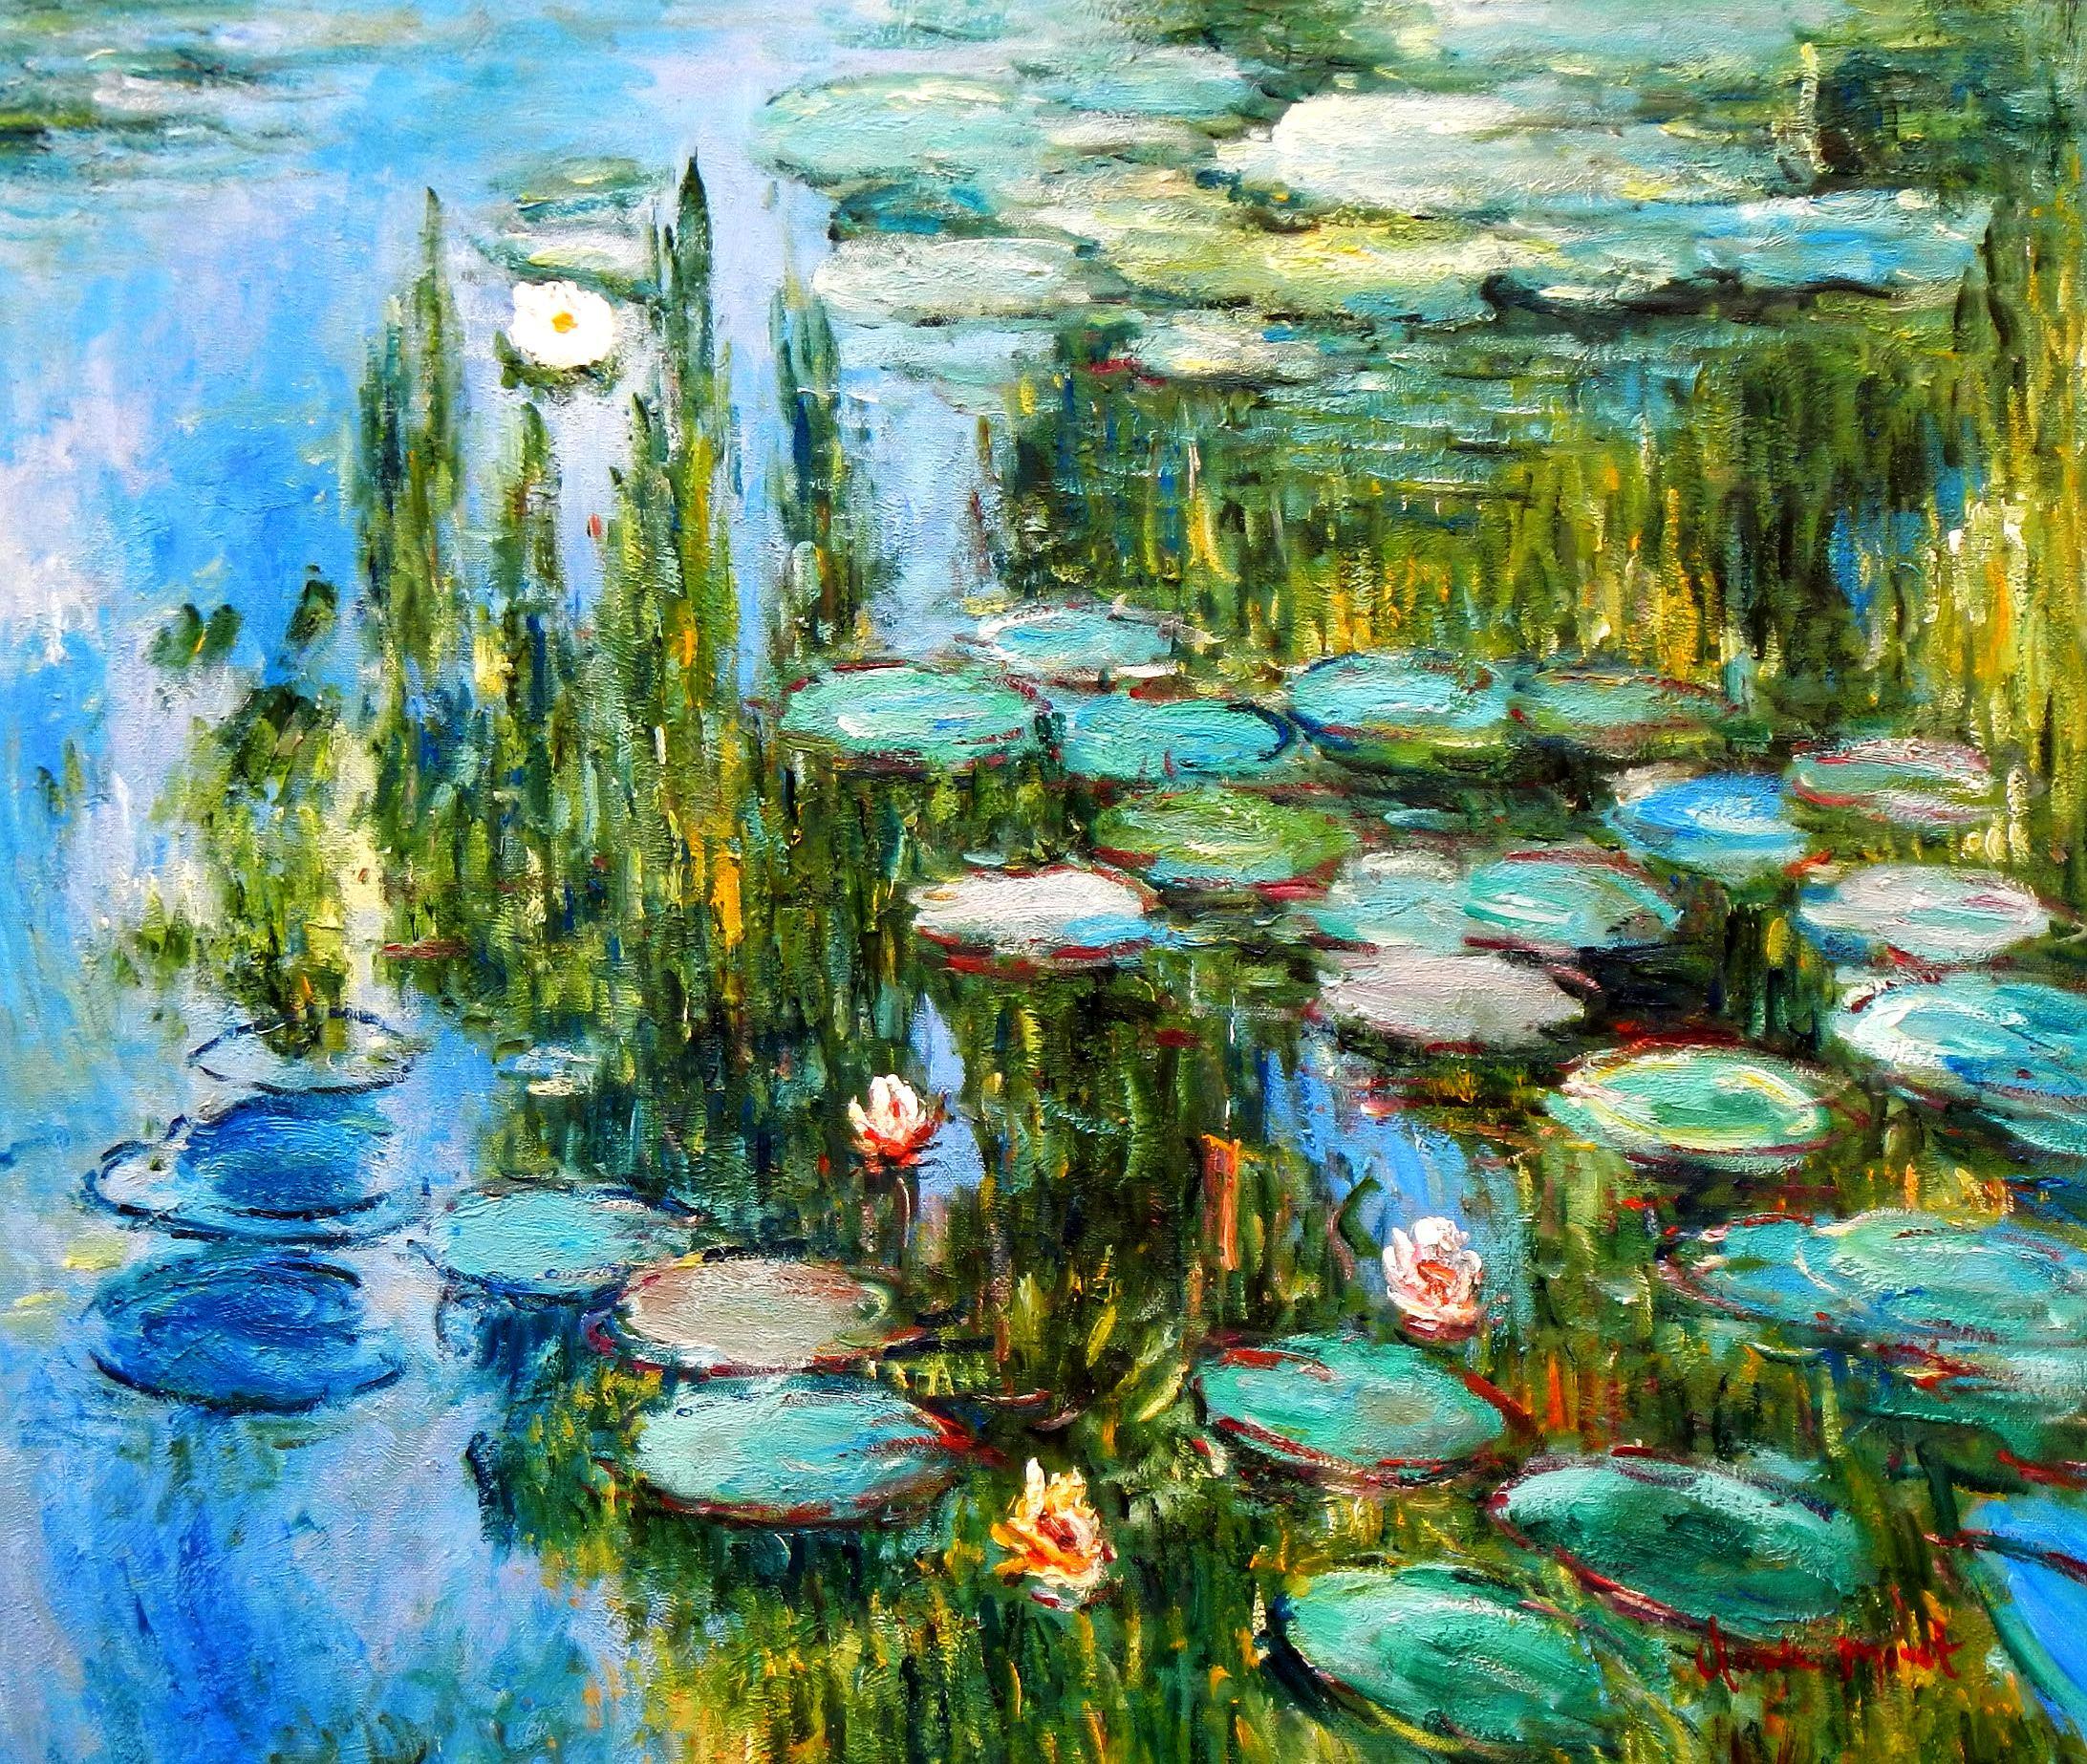 Claude Monet - Seerosen im Frühling c94227 50x60cm Ölgemälde handgemalt